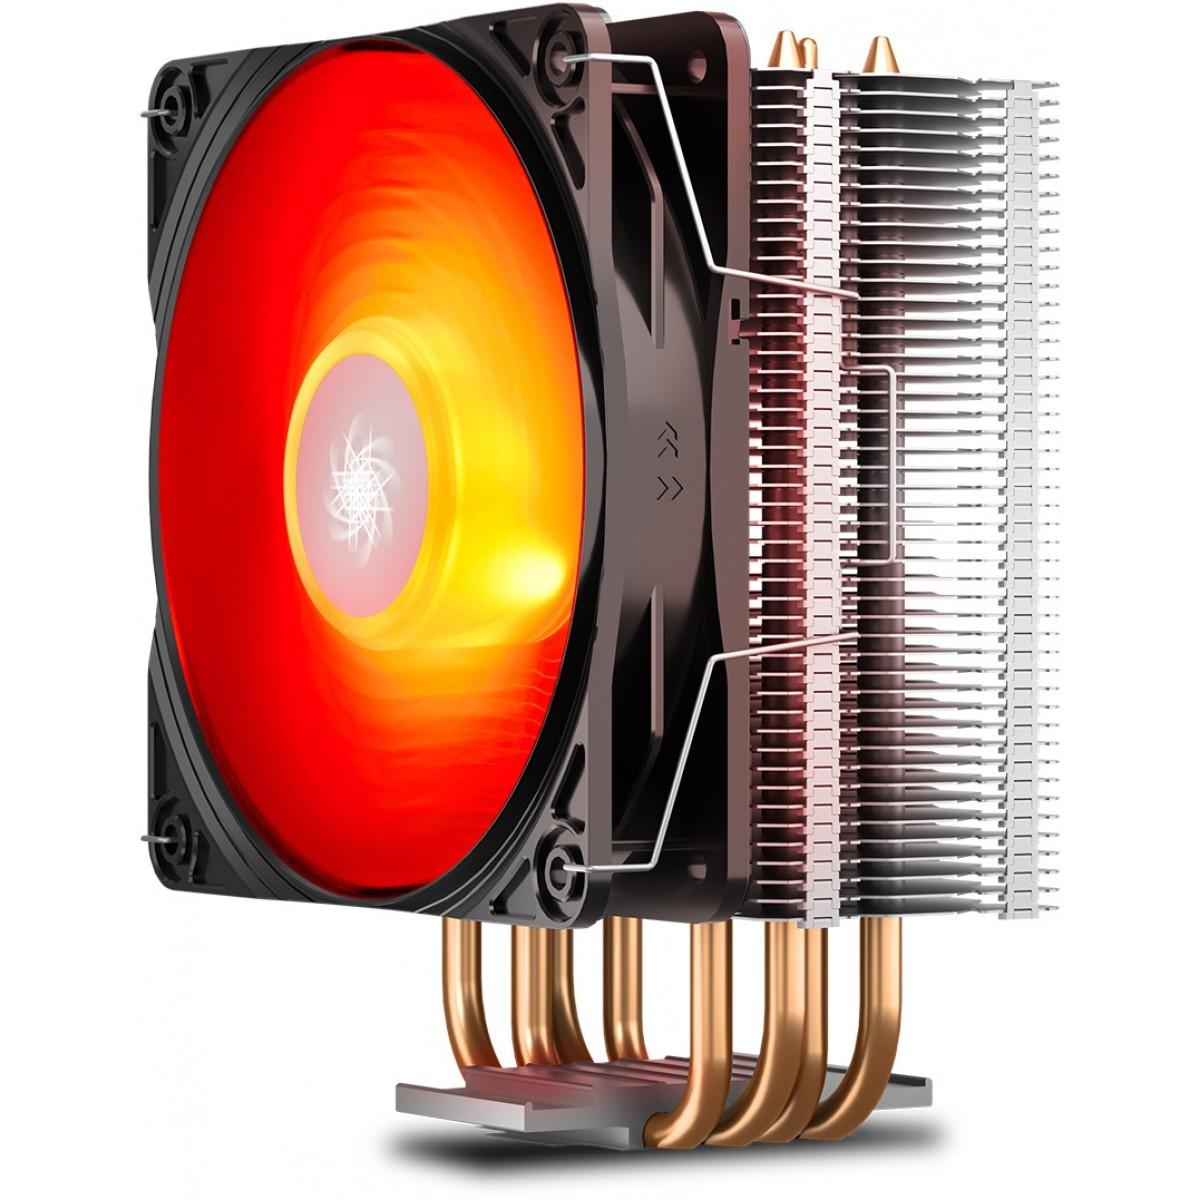 Kit Upgrade Biostar Radeon RX 550 2GB + Ryzen 3 3300X + Memória DDR4 16GB (2x8GB) 3000Mhz + Brinde Cooler